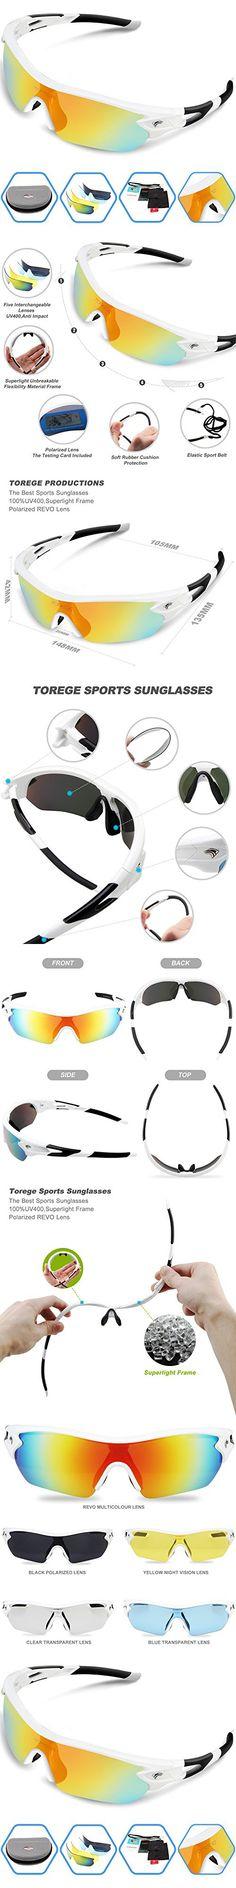 Torege Polarized Sports Sunglasses With 5 Interchangeable Lenes for Men Women Cycling Running Driving Fishing Golf Baseball Glasses TR002 (White&Black)